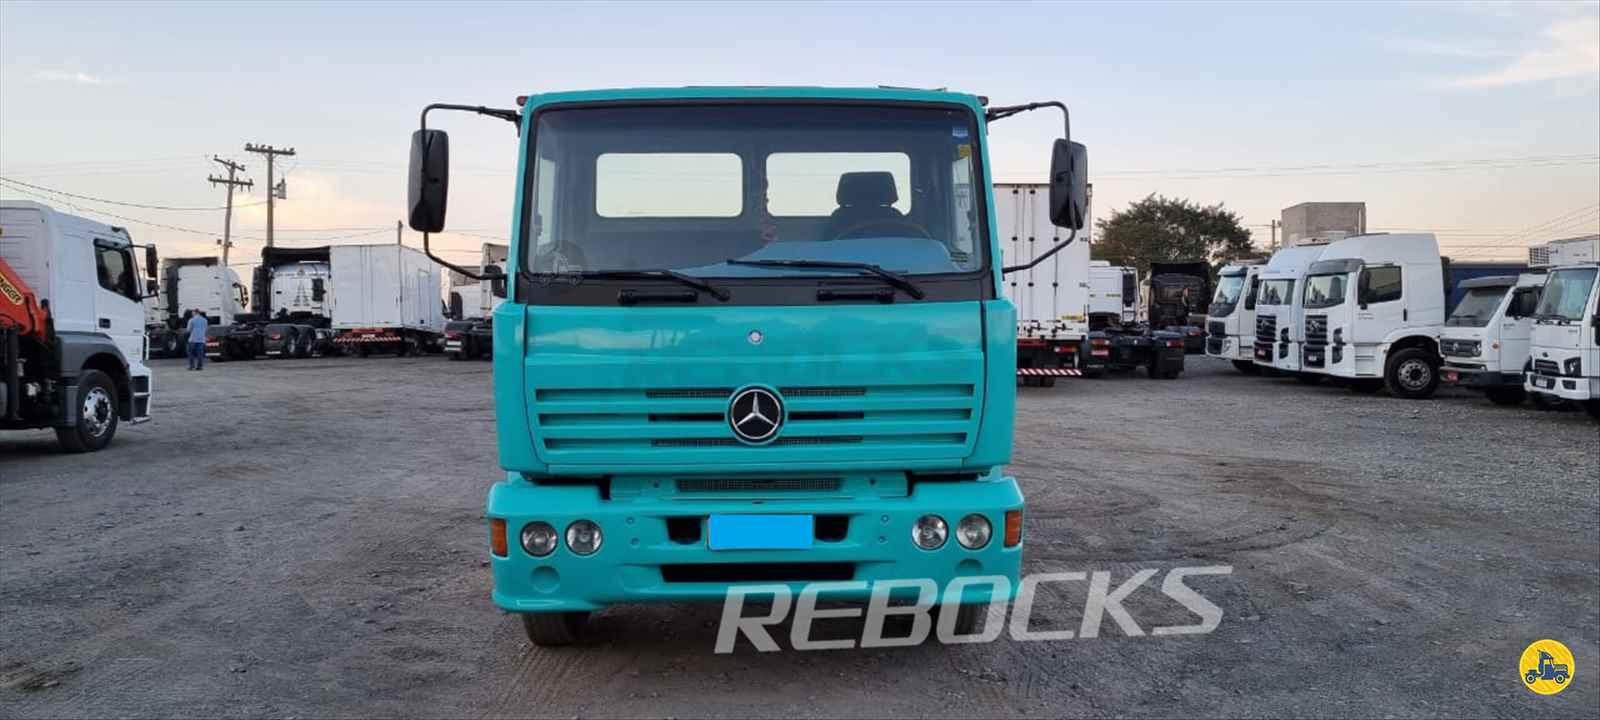 MB 1718 de Rebocks - LIMEIRA/SP